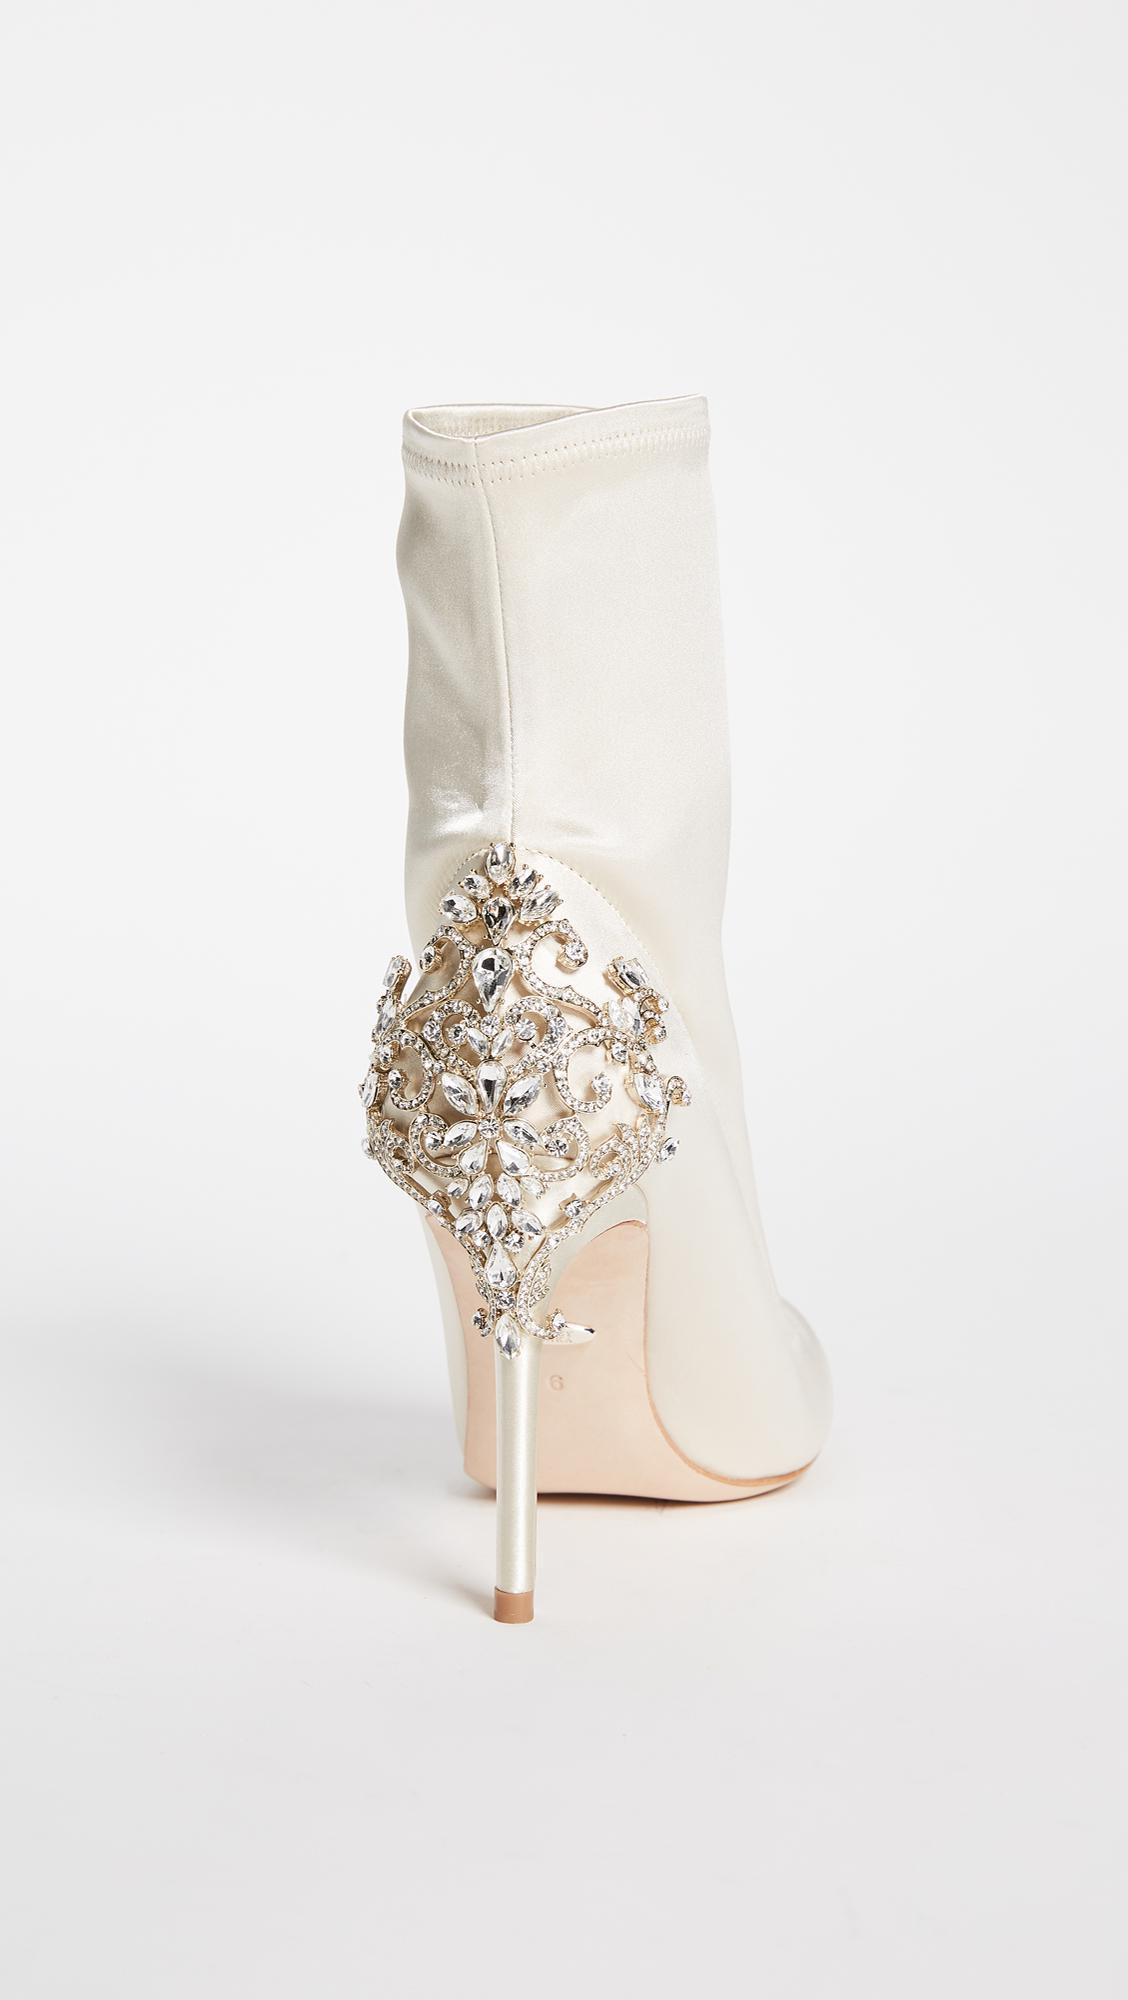 Overlay Luna Clarks Shoes